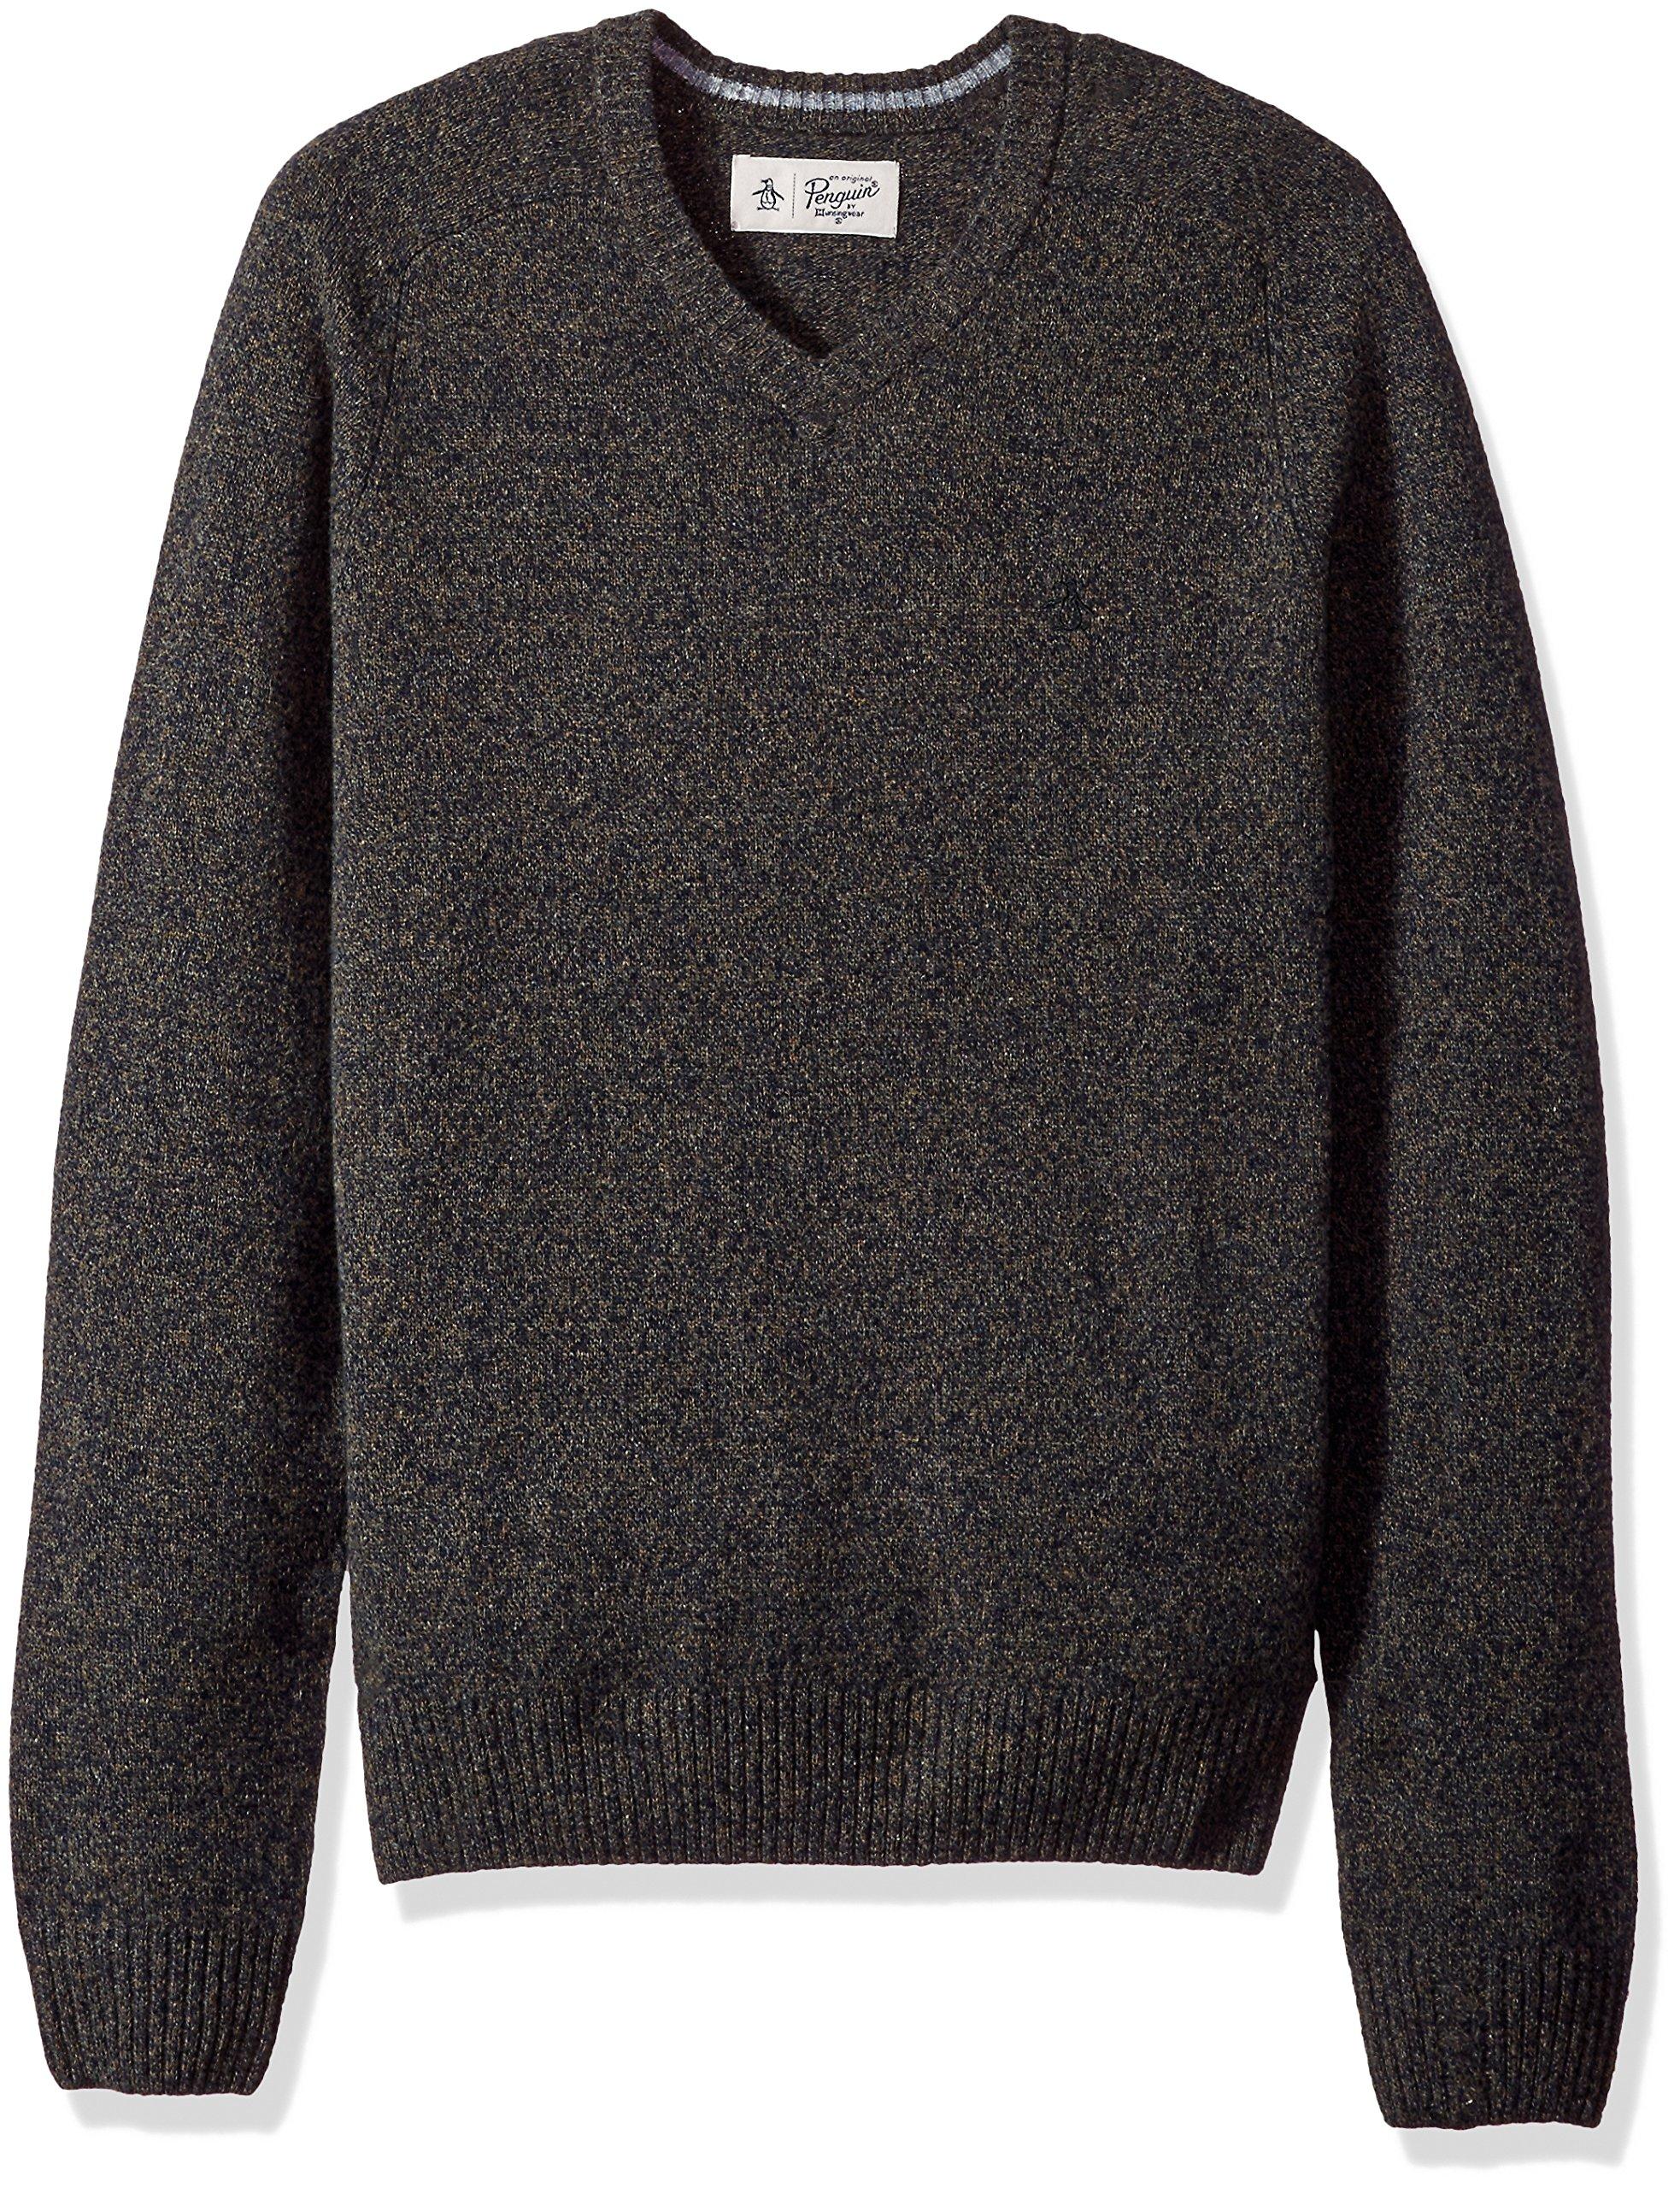 Original Penguin Men's P55 100% Lambswool V-Neck Sweater, Dark Sapphire, Extra Large